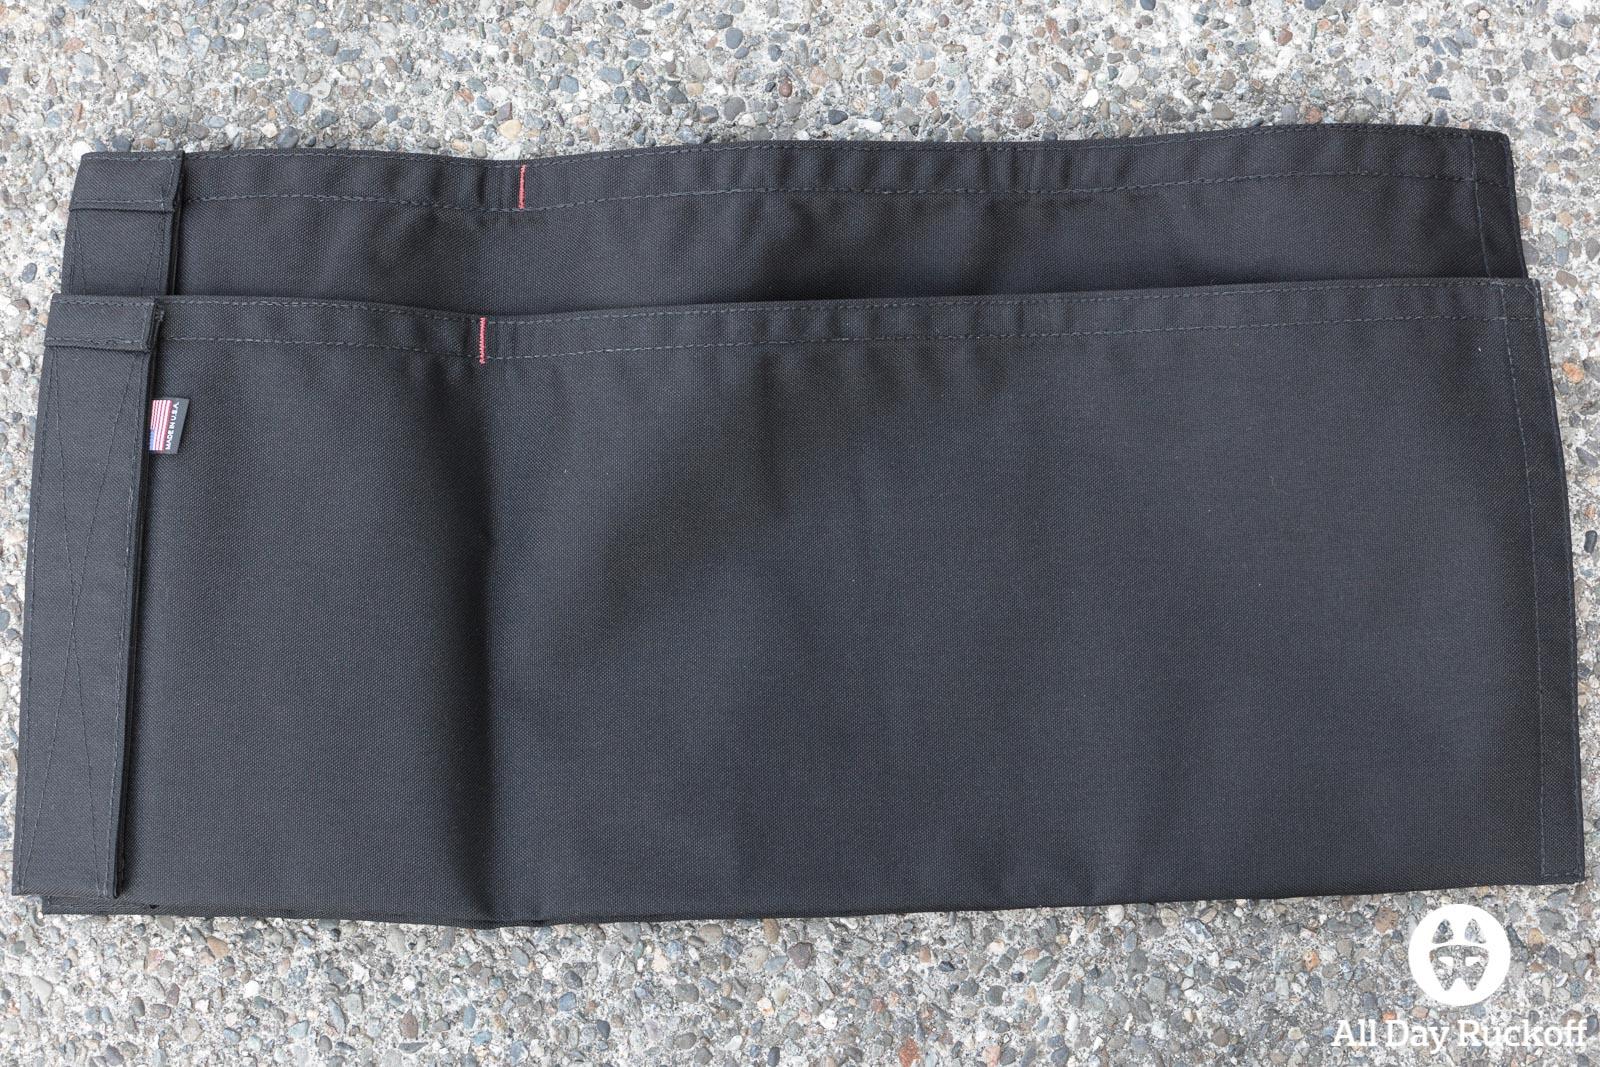 Brute Force Athlete Sandbag - New Filler Bags